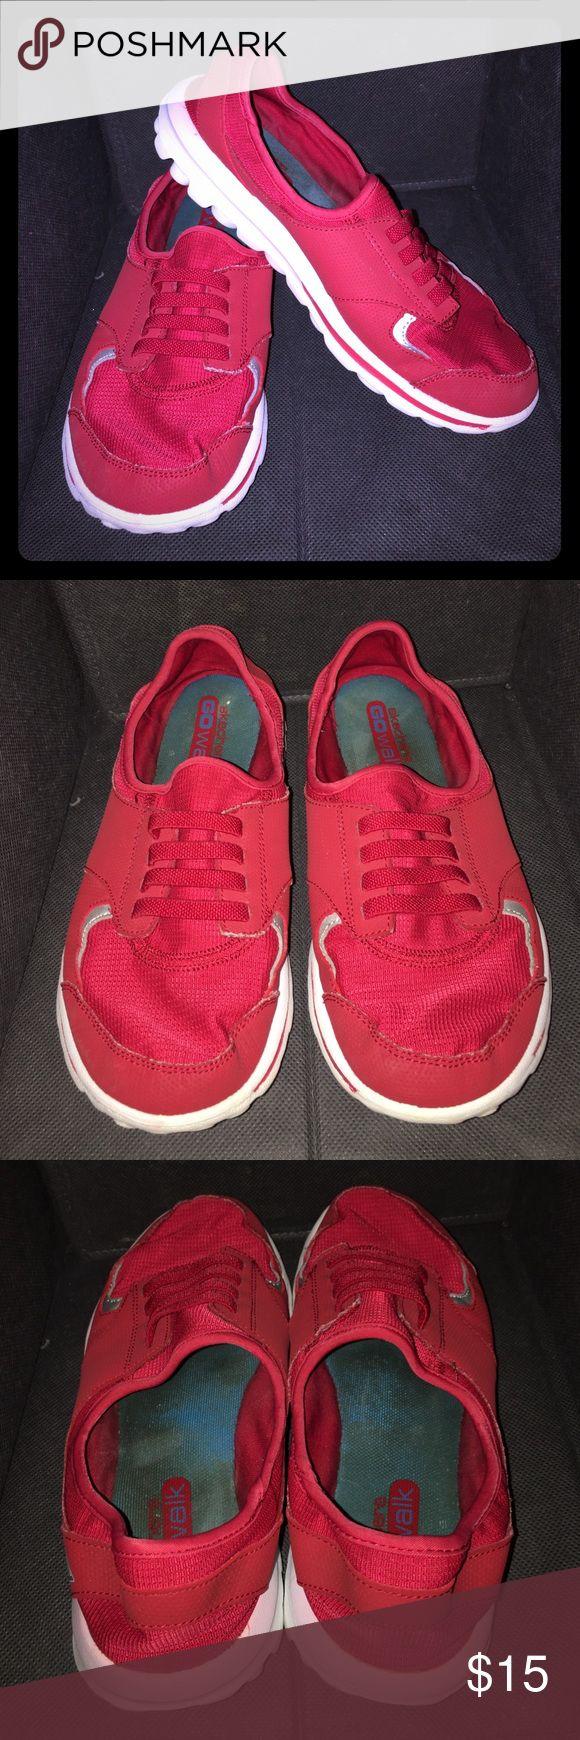 Sketchers GO Walk Gently used. Freshly laundered, super comfy go walks. Skechers Shoes Sneakers